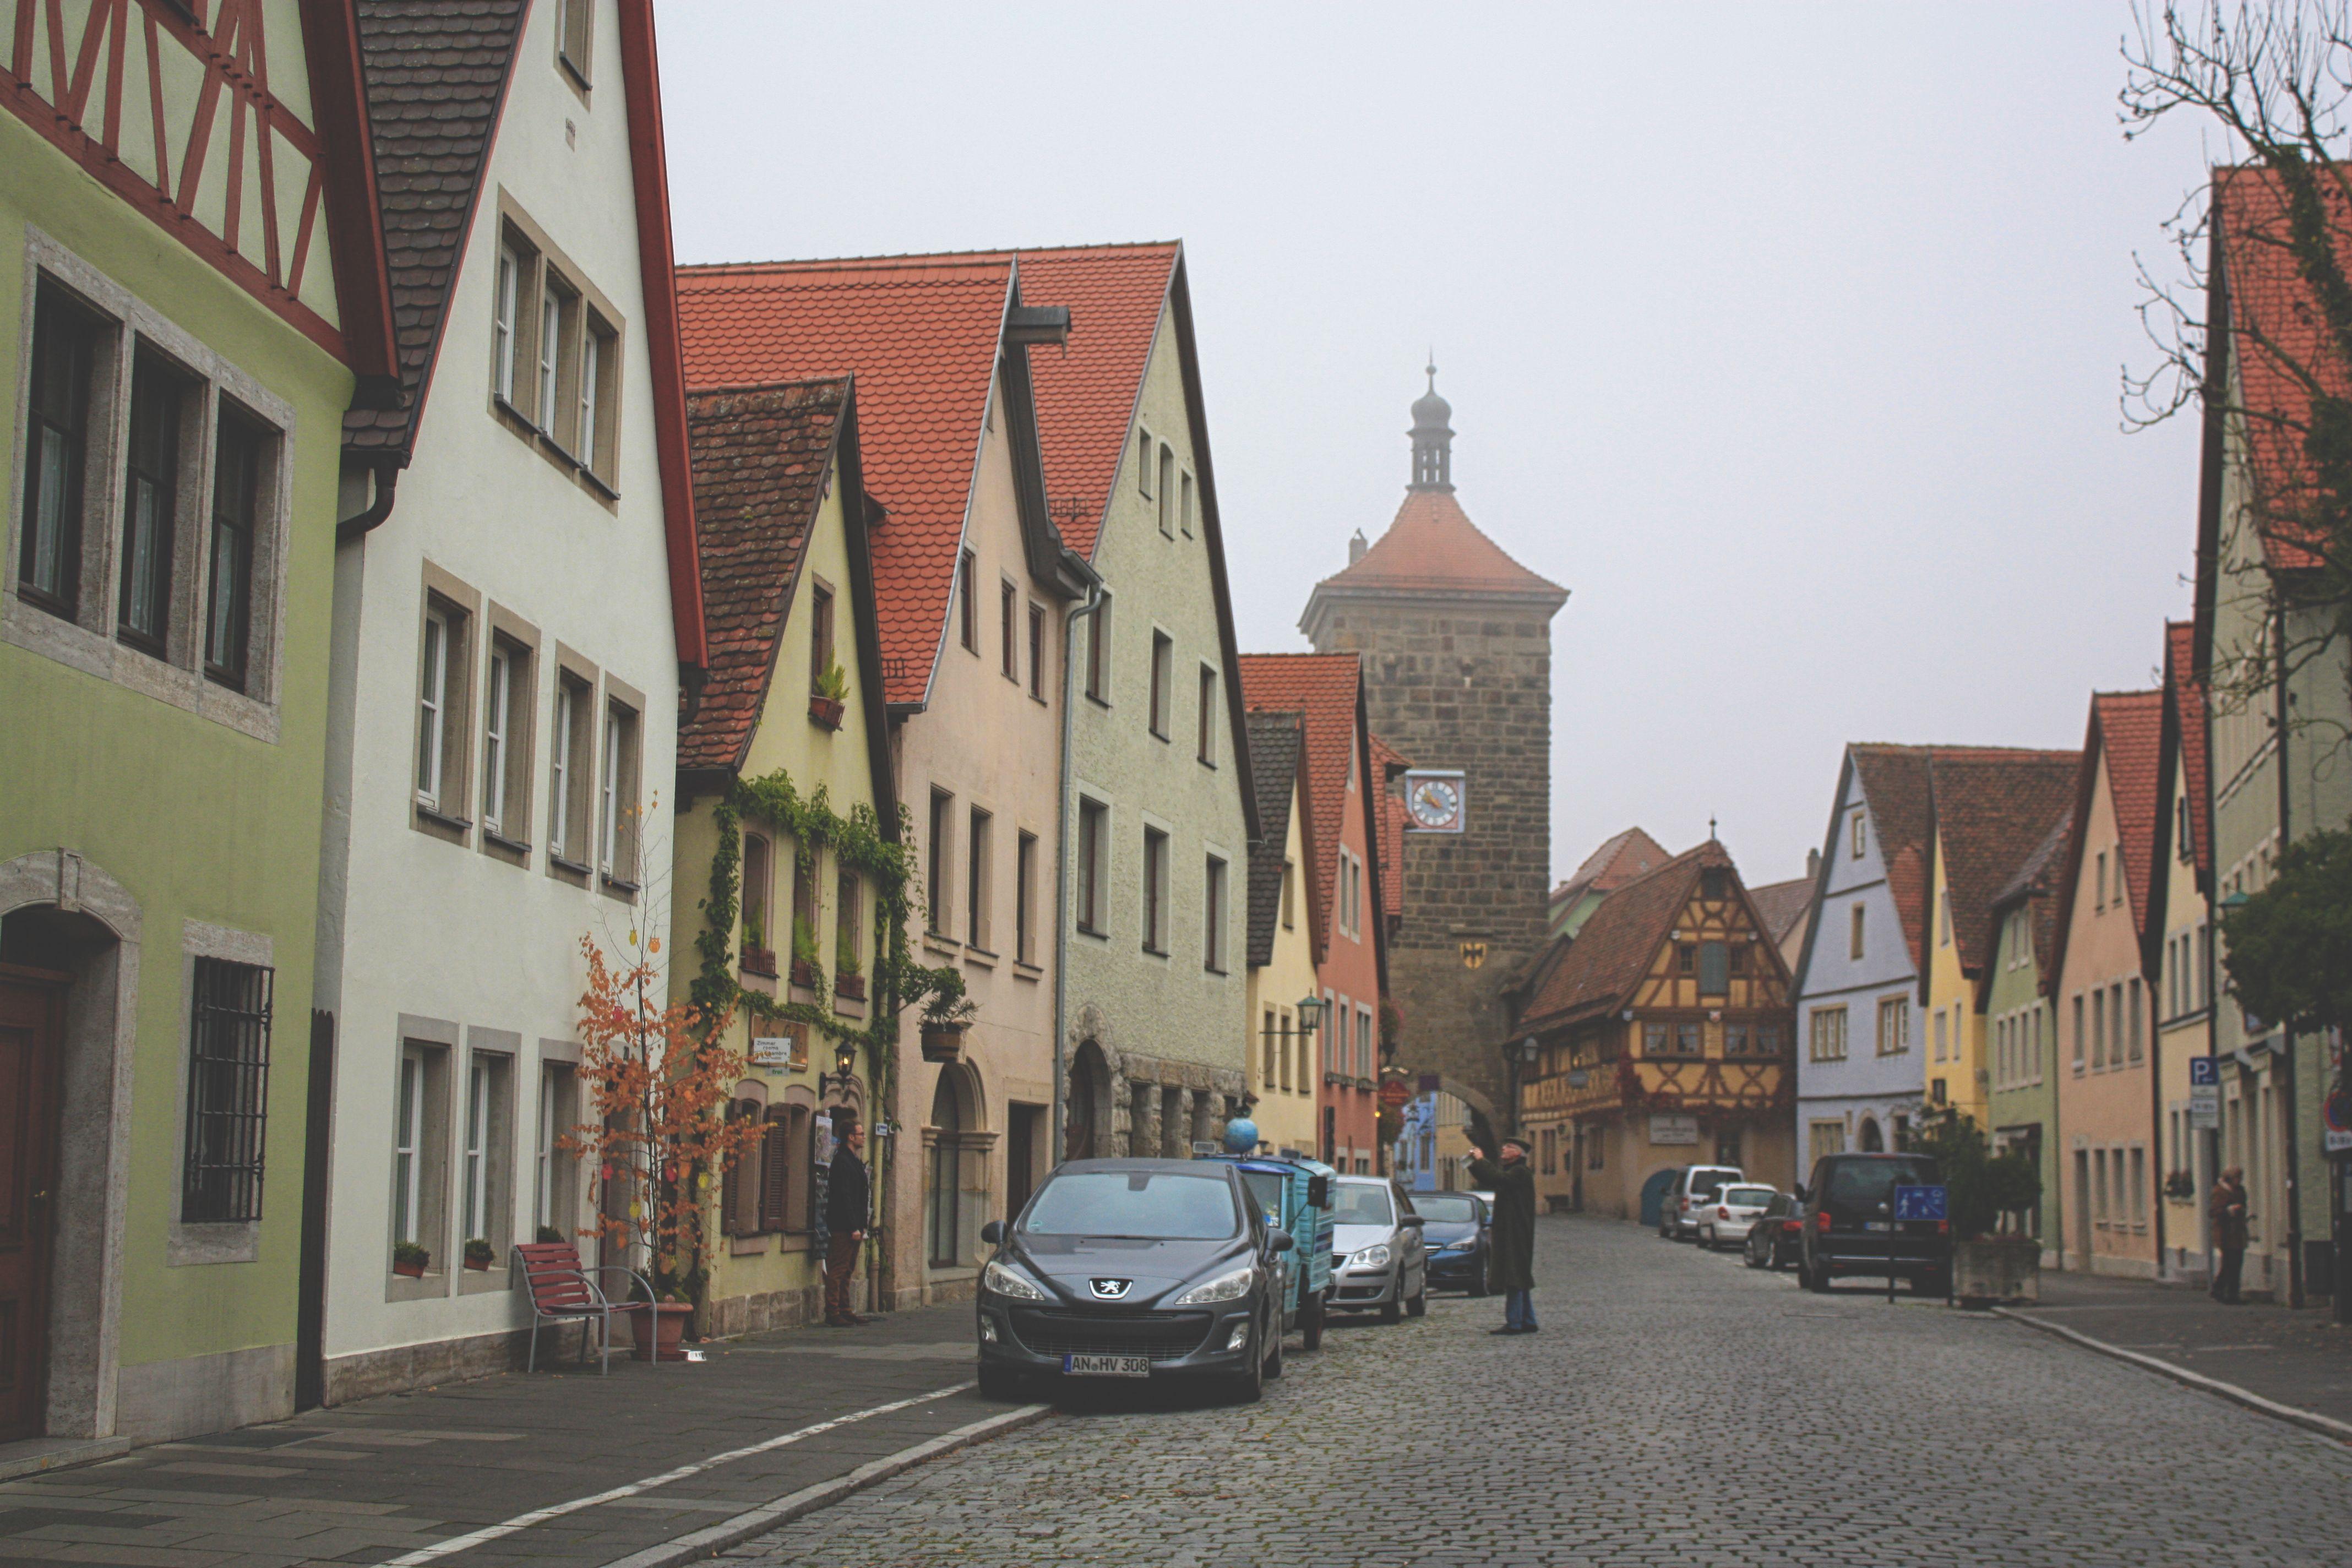 Rotemburgo - Alemania Nov 2014